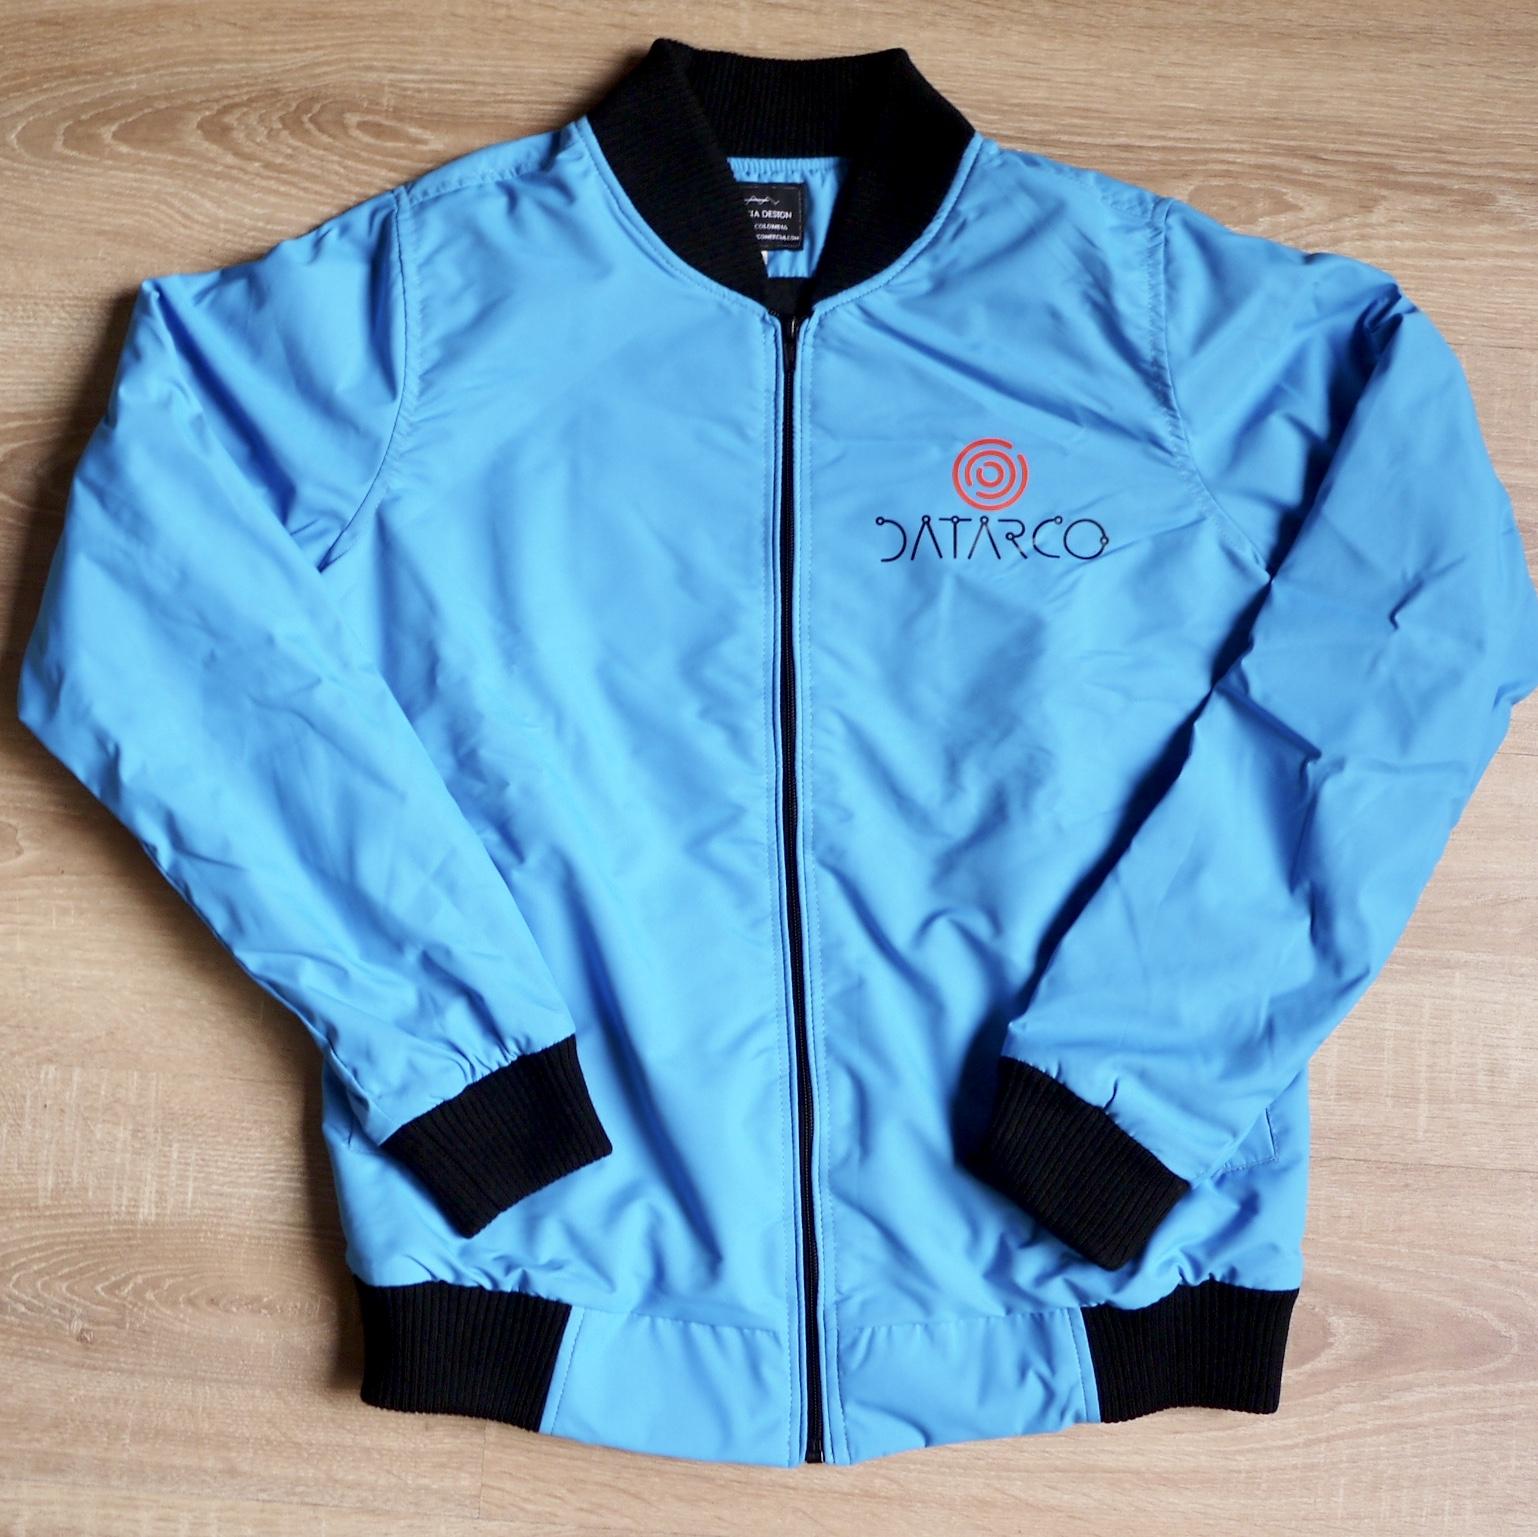 Chaqueta Institucional Bomber Jacket